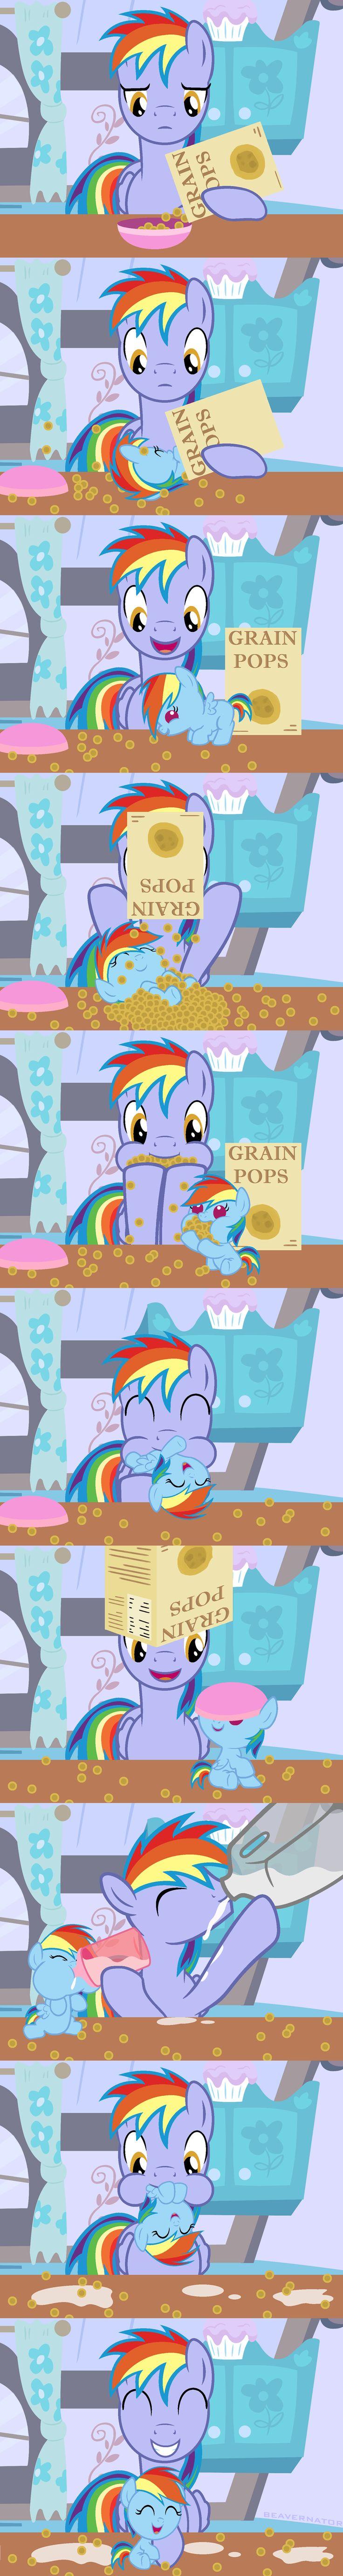 #667397 - artist:beavernator, baby dash, baby pony, beavernator is trying to murder us, cereal, comic, cute, dashabetes, father, father and daughter, filly, foal, milk, rainbow blaze, rainbow dash, safe, tummy buzz - Derpibooru - My Little Pony: Friendship is Magic Imageboard